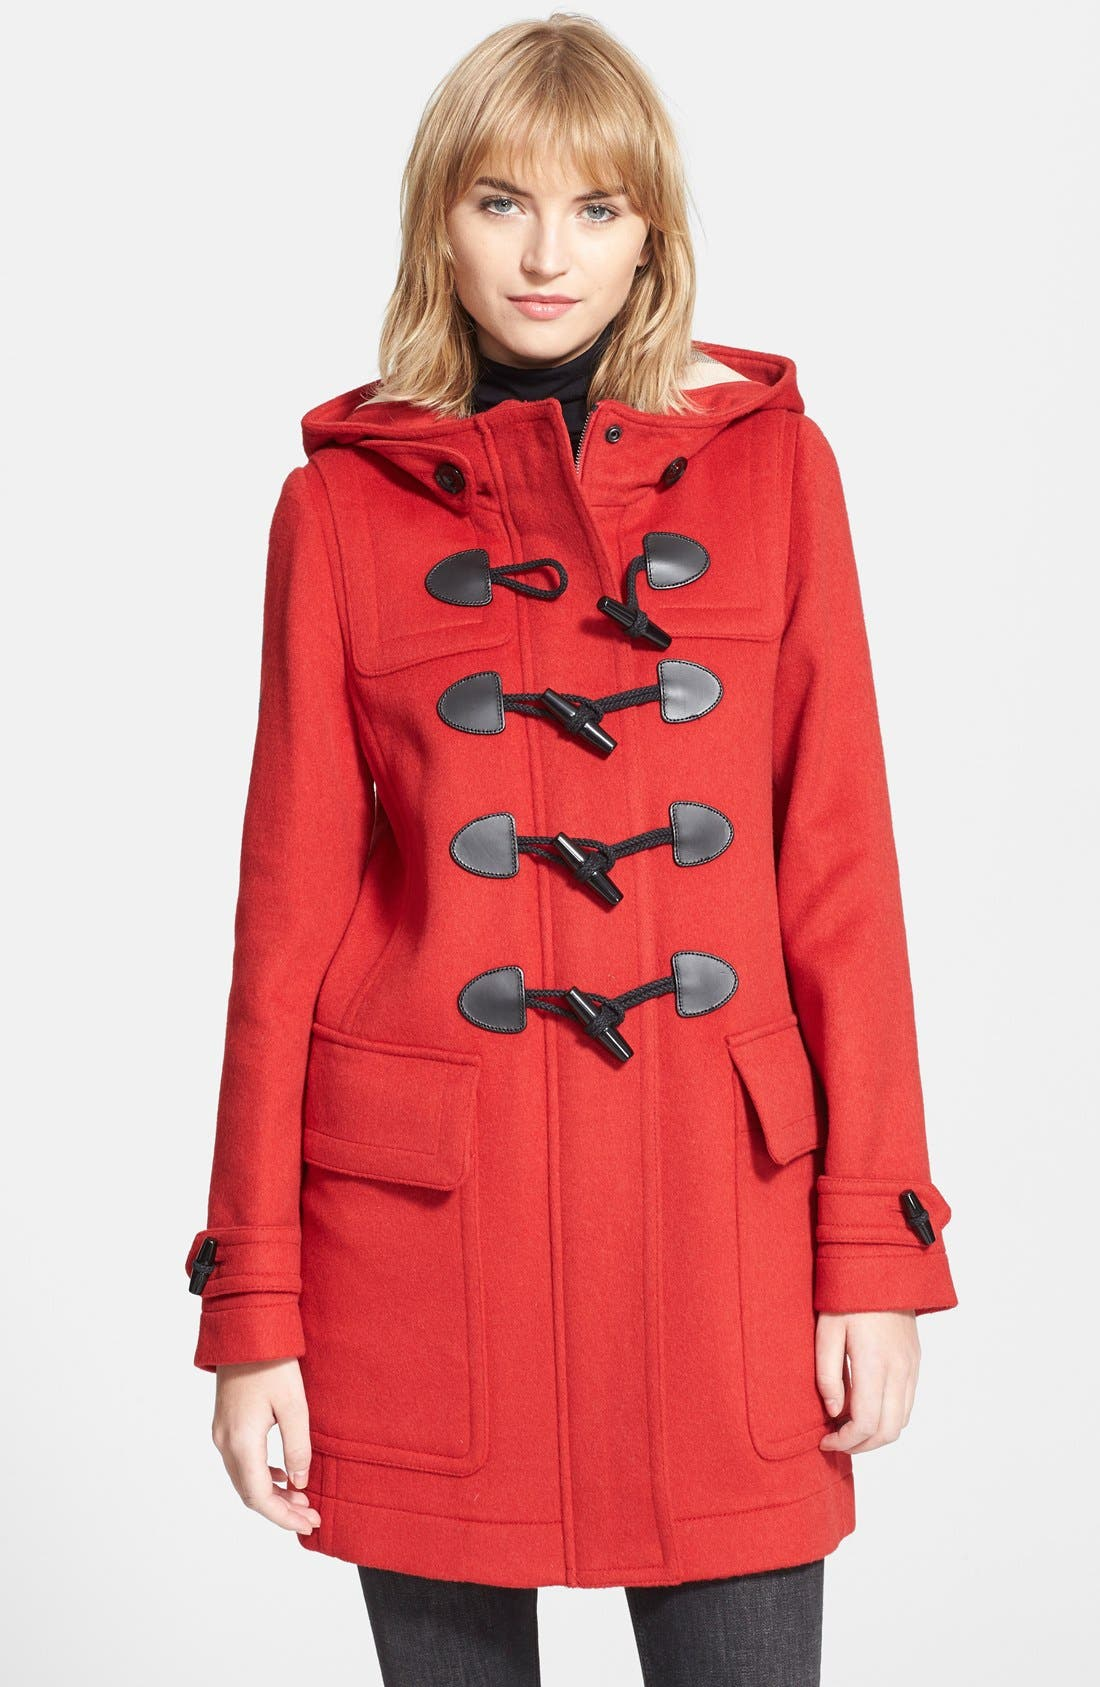 Alternate Image 1 Selected - Burberry Brit Finsdale Wool Duffle Coat